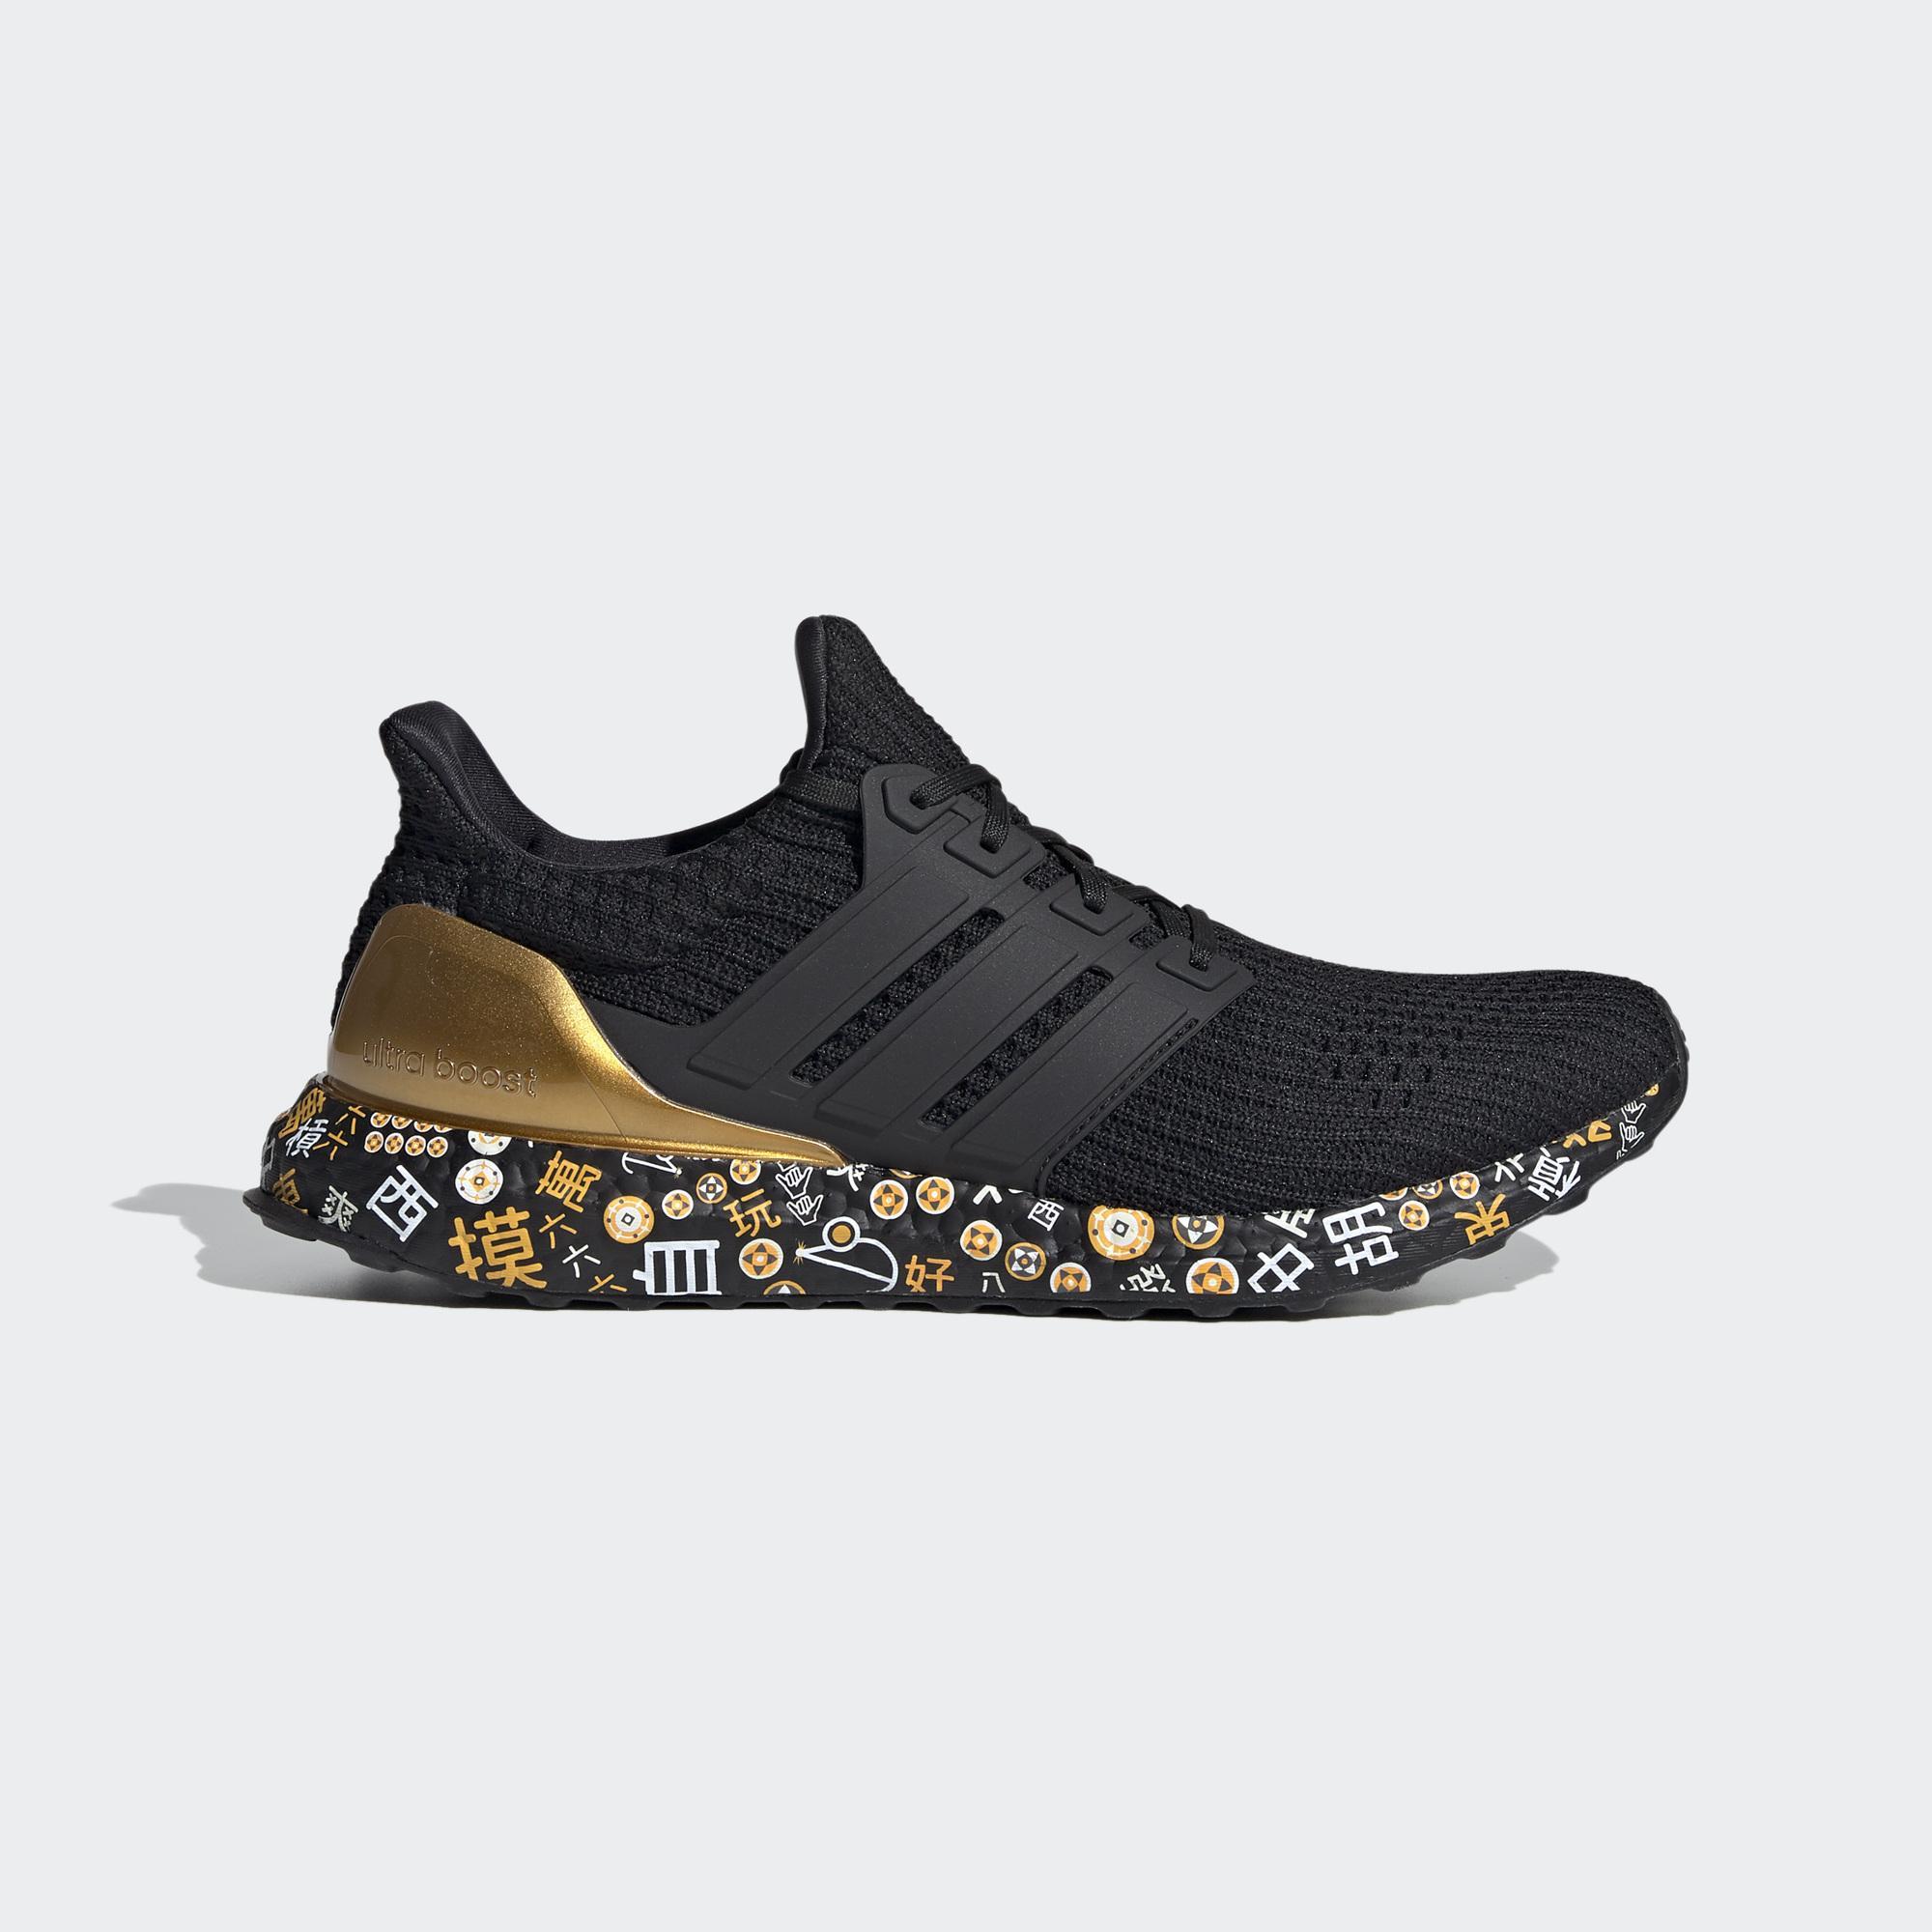 Ultraboost 跑鞋